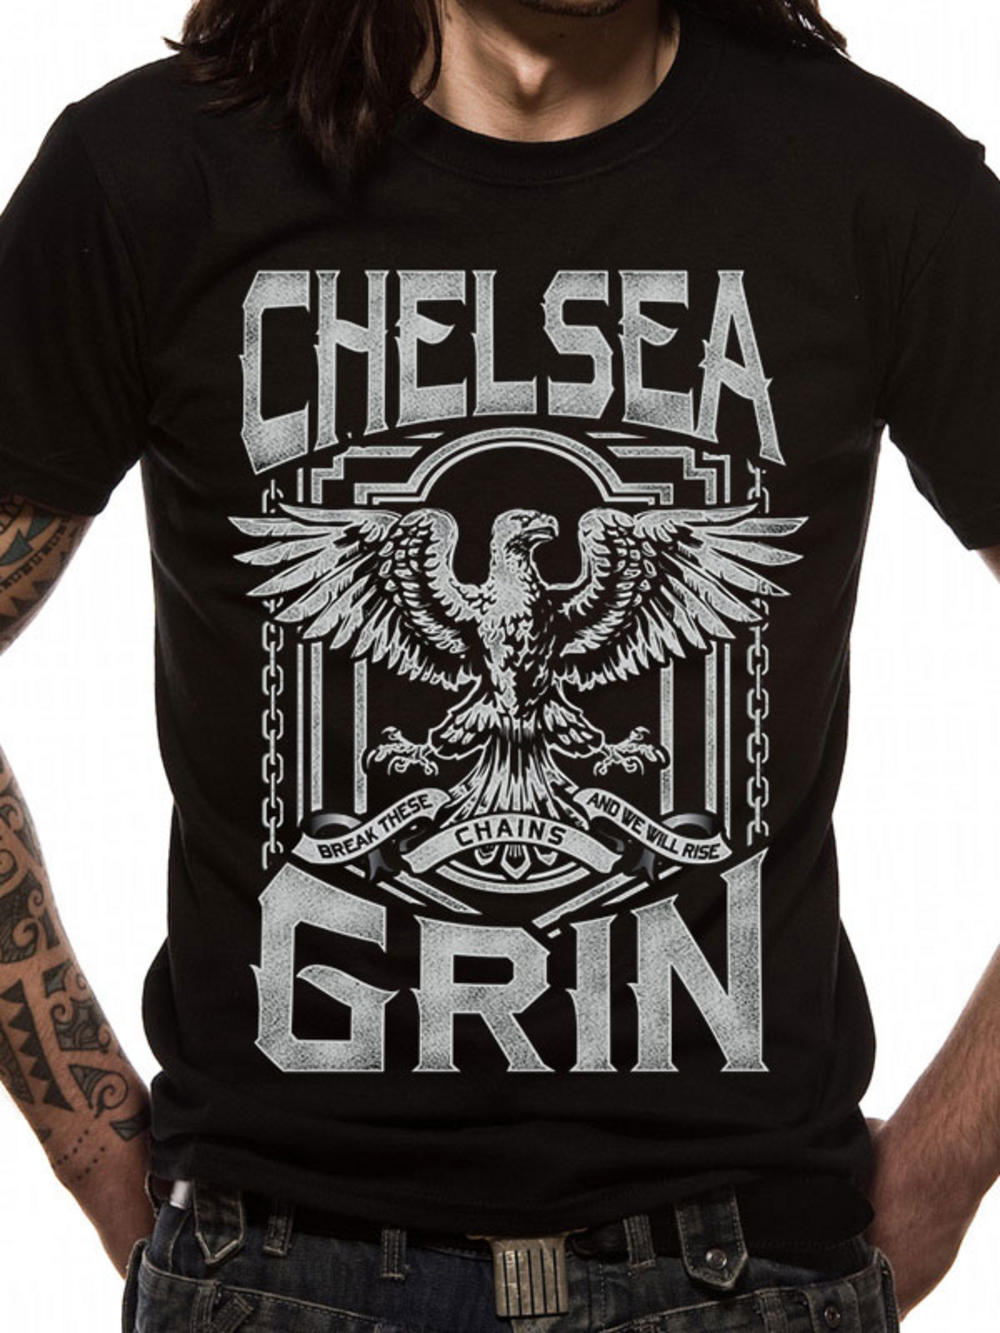 chelsea grin chainbreaker t shirt buy chelsea grin chainbreaker t shirt at. Black Bedroom Furniture Sets. Home Design Ideas